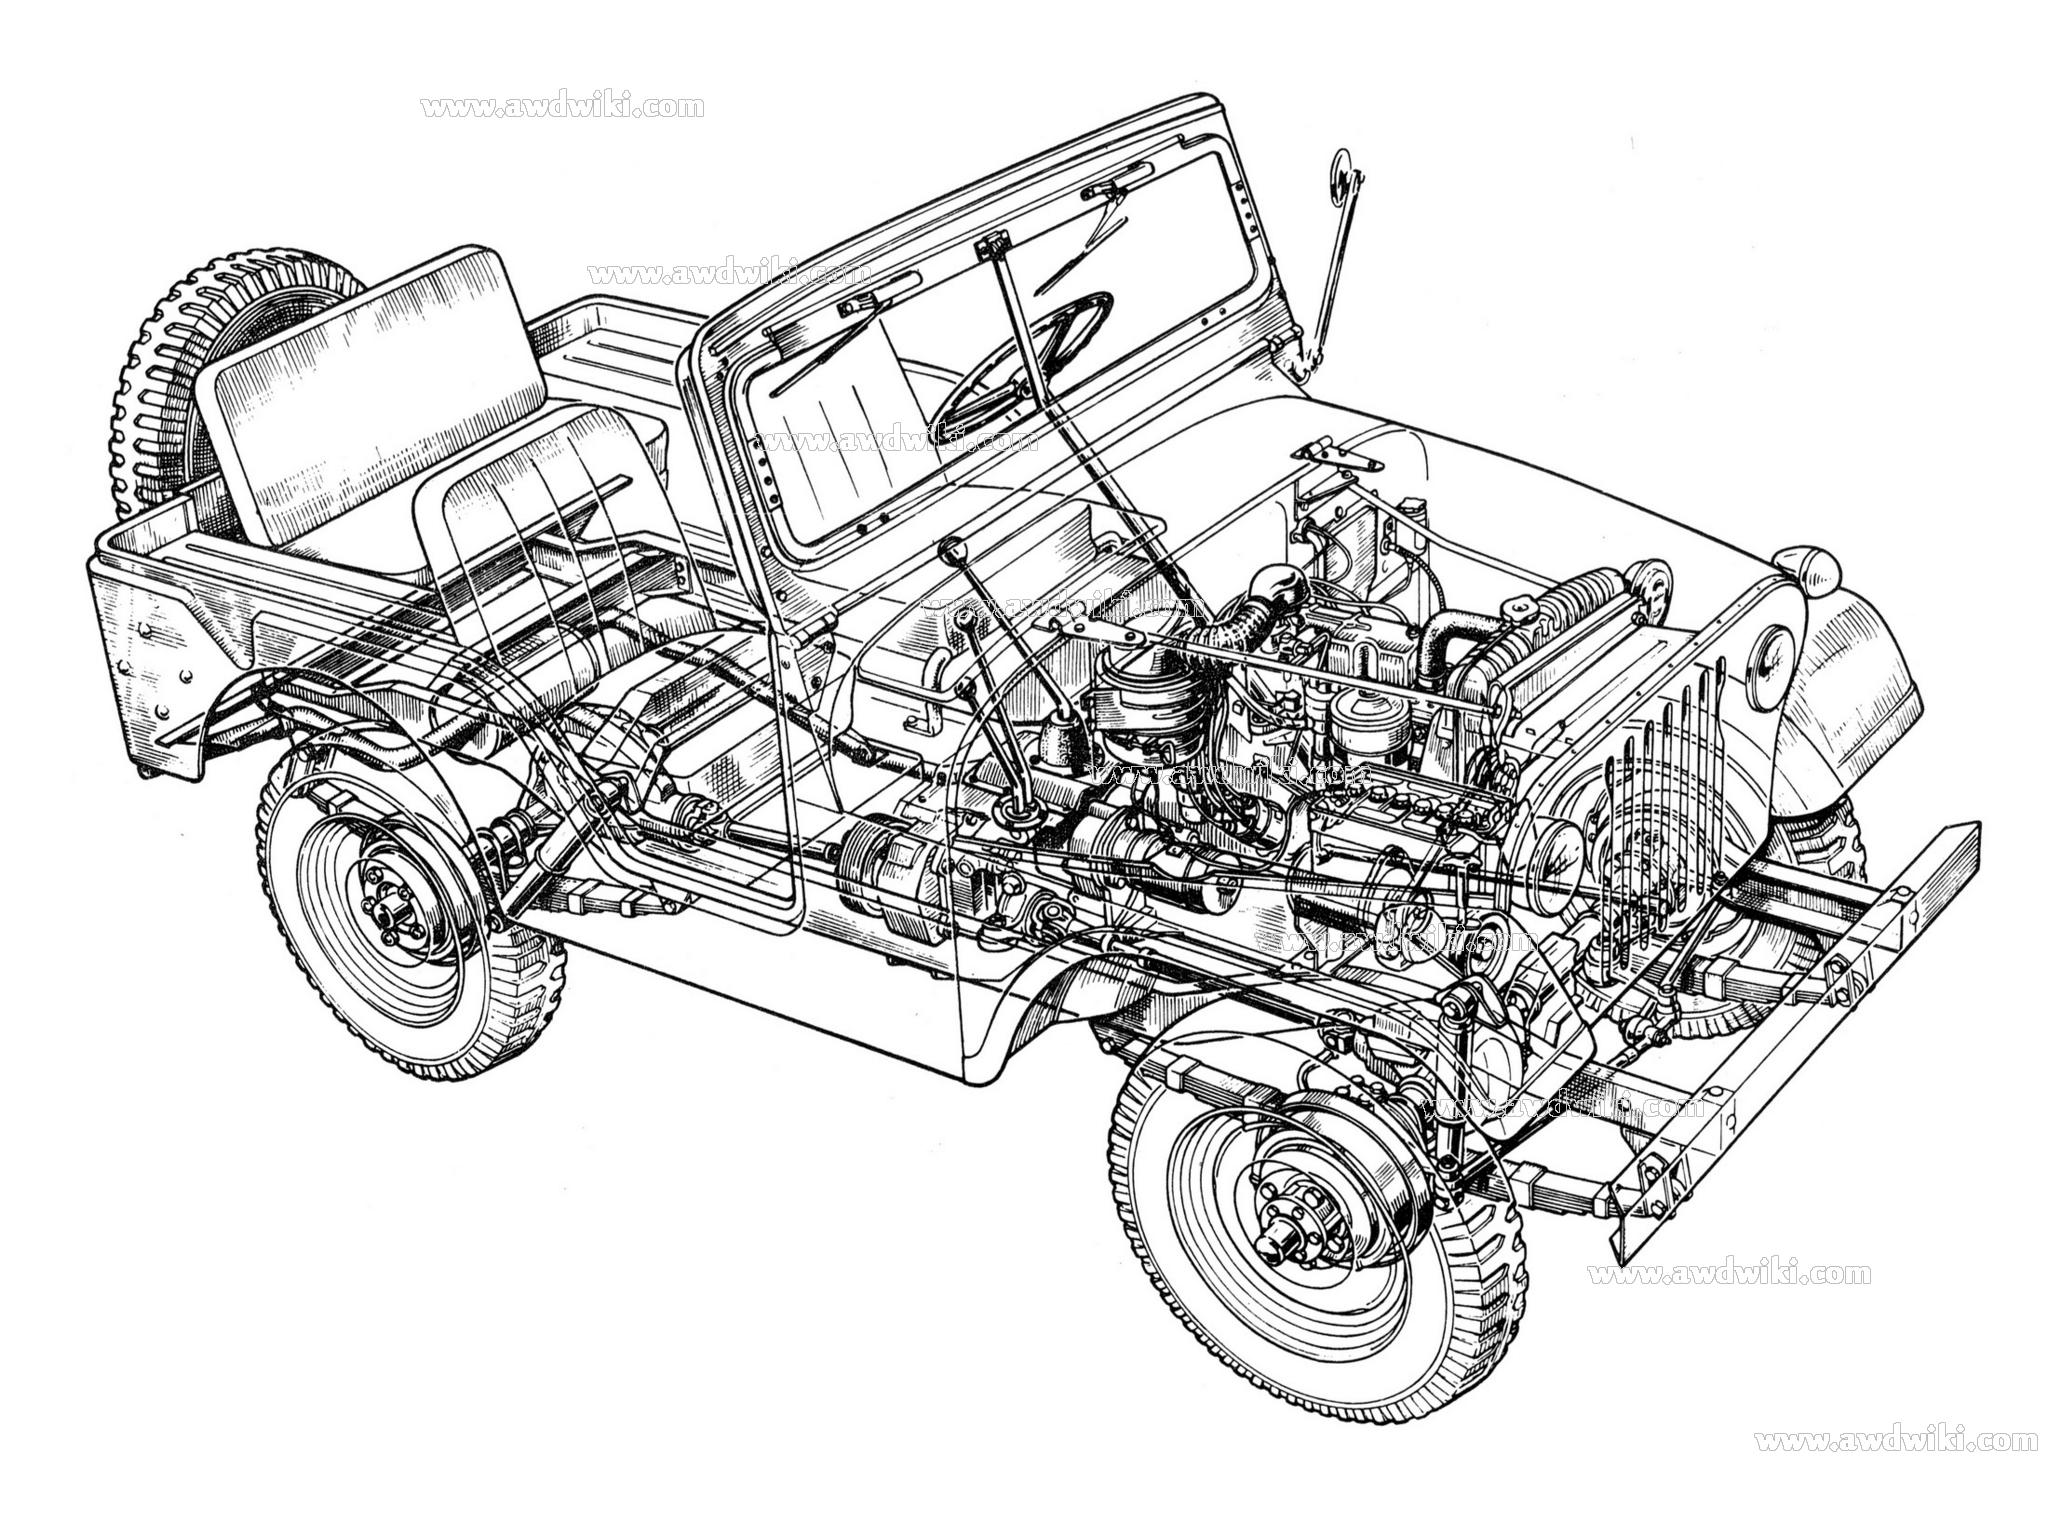 Jeep All Wheel Drive Explained Awd Cars 4x4 Vehicles 4wd Trucks 13 Grand Cherokee Wj Wrangler Patriot Cj 5